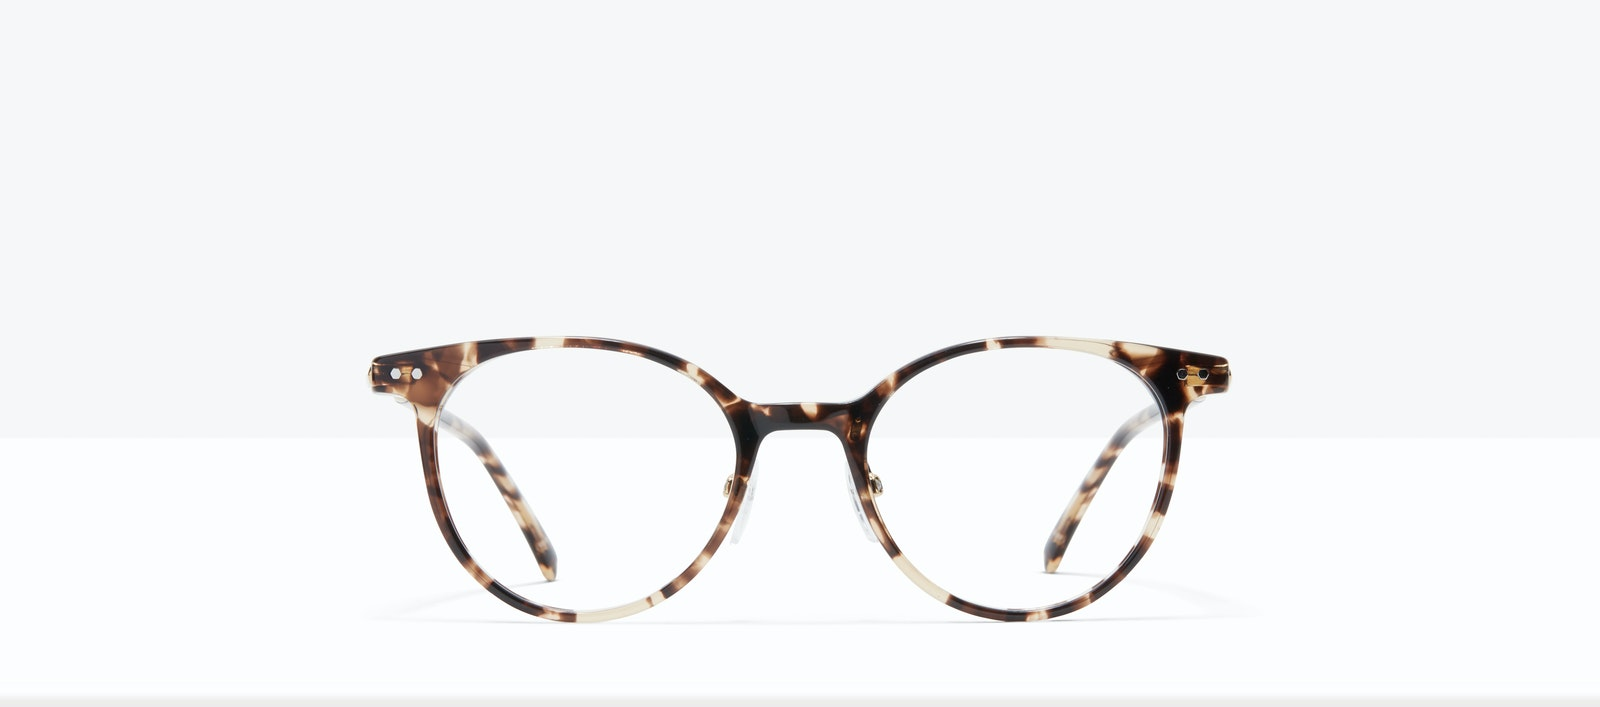 Affordable Fashion Glasses Round Eyeglasses Women Lightheart L Leopard Front